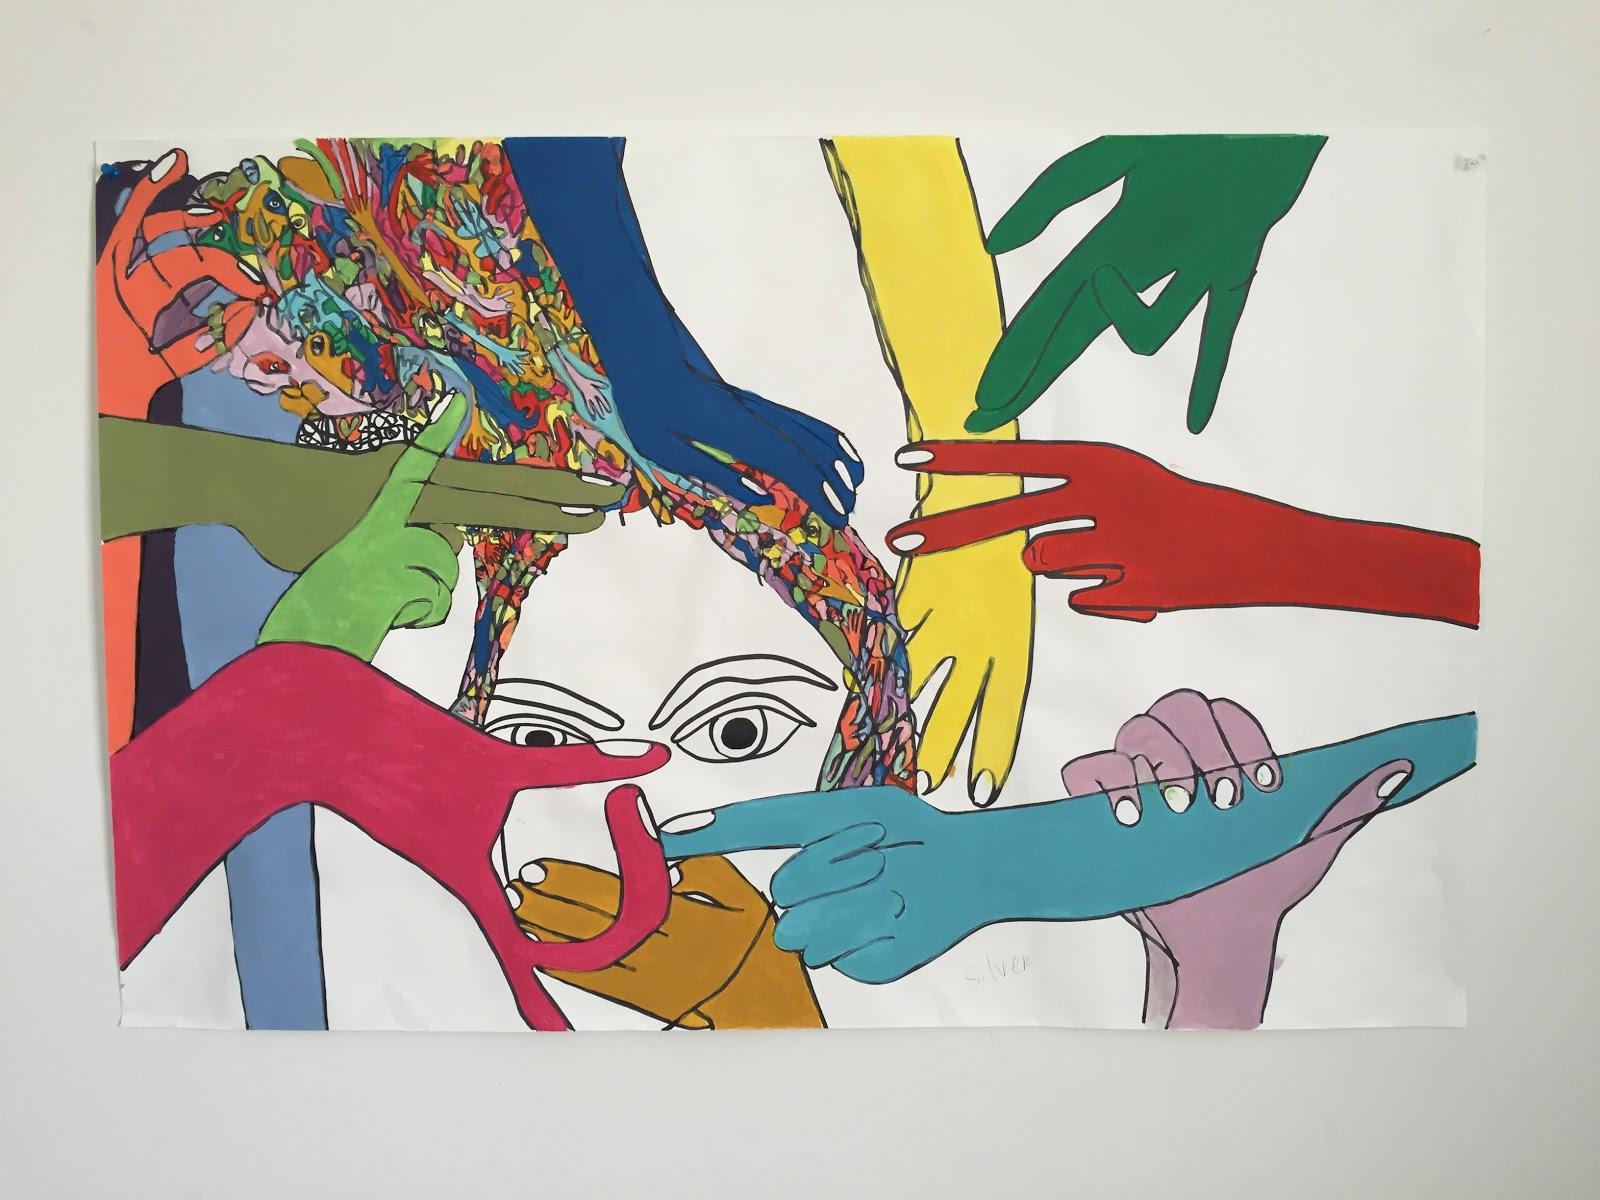 Artwork by Marina Sachs